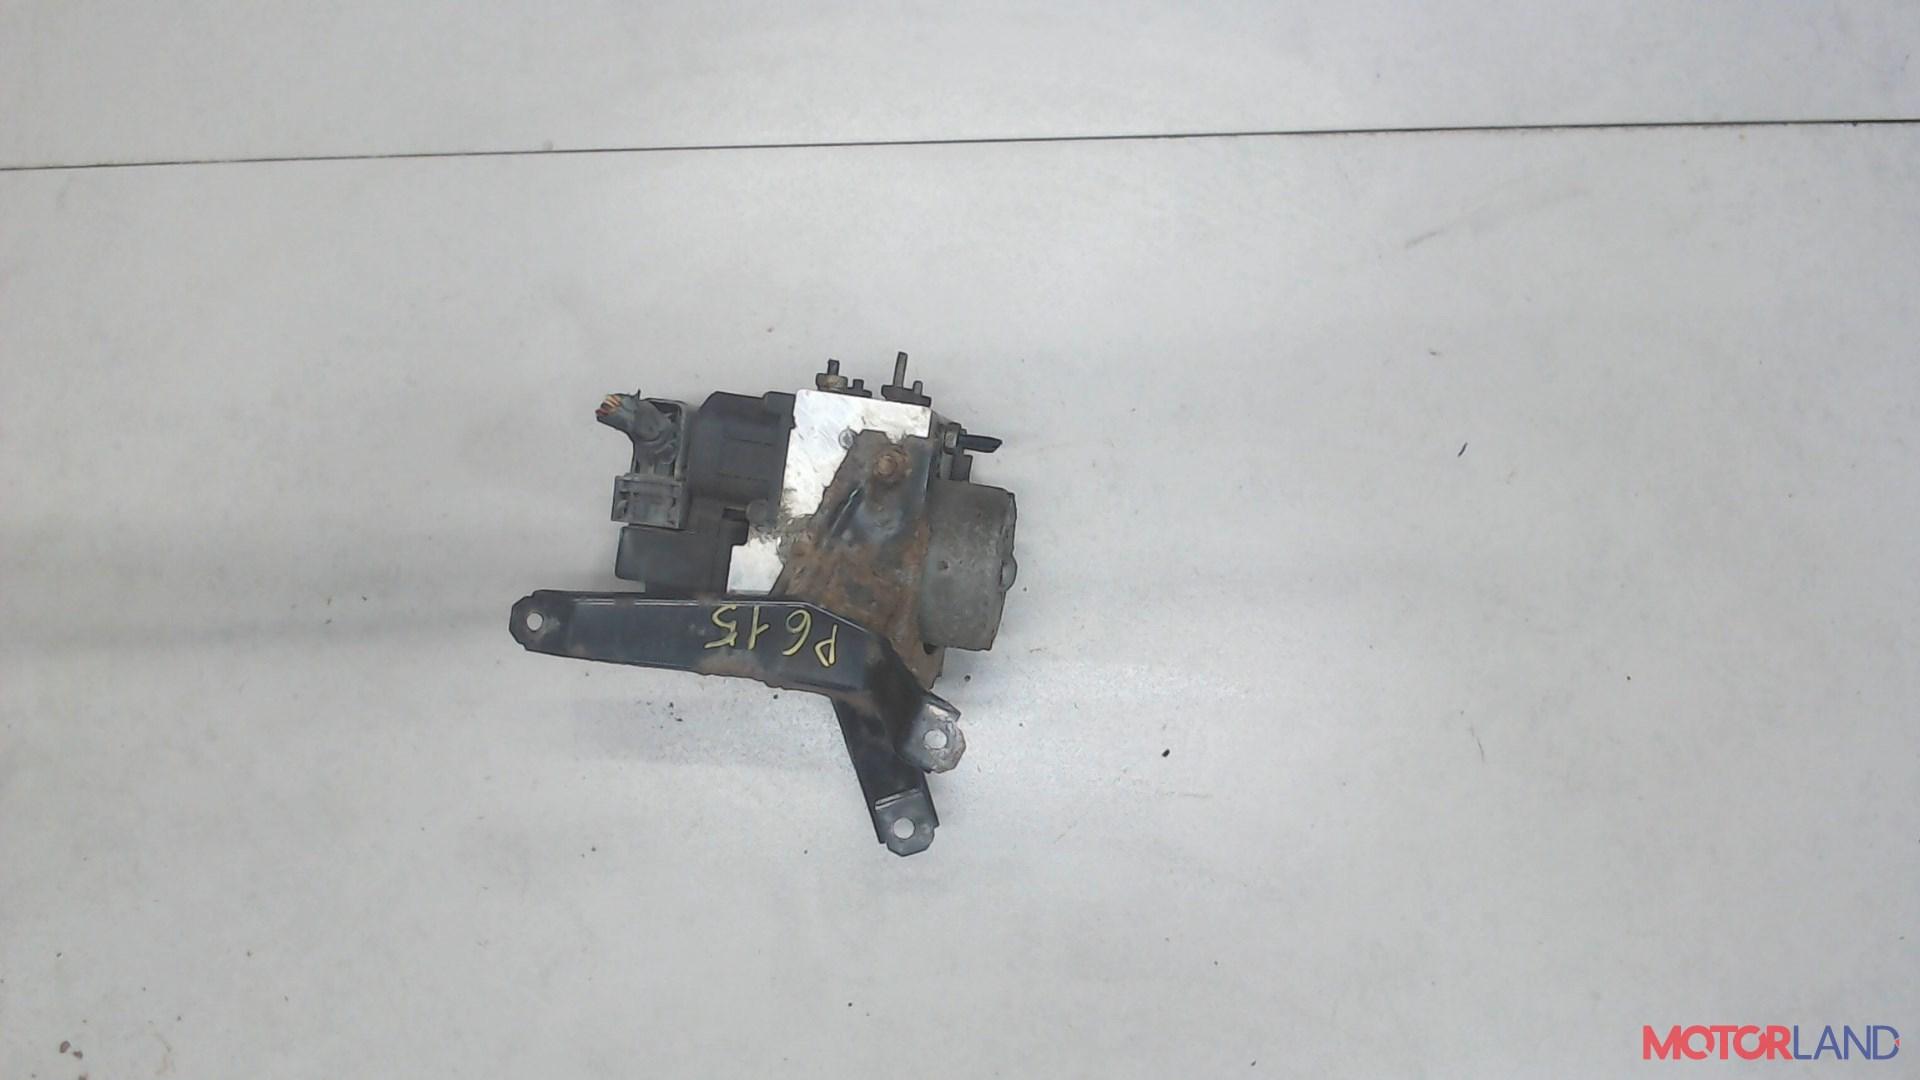 Блок АБС, насос (ABS, ESP, ASR) Chevrolet Equinox 2005-2009 3.4 л. 2005 LNJ б/у #1